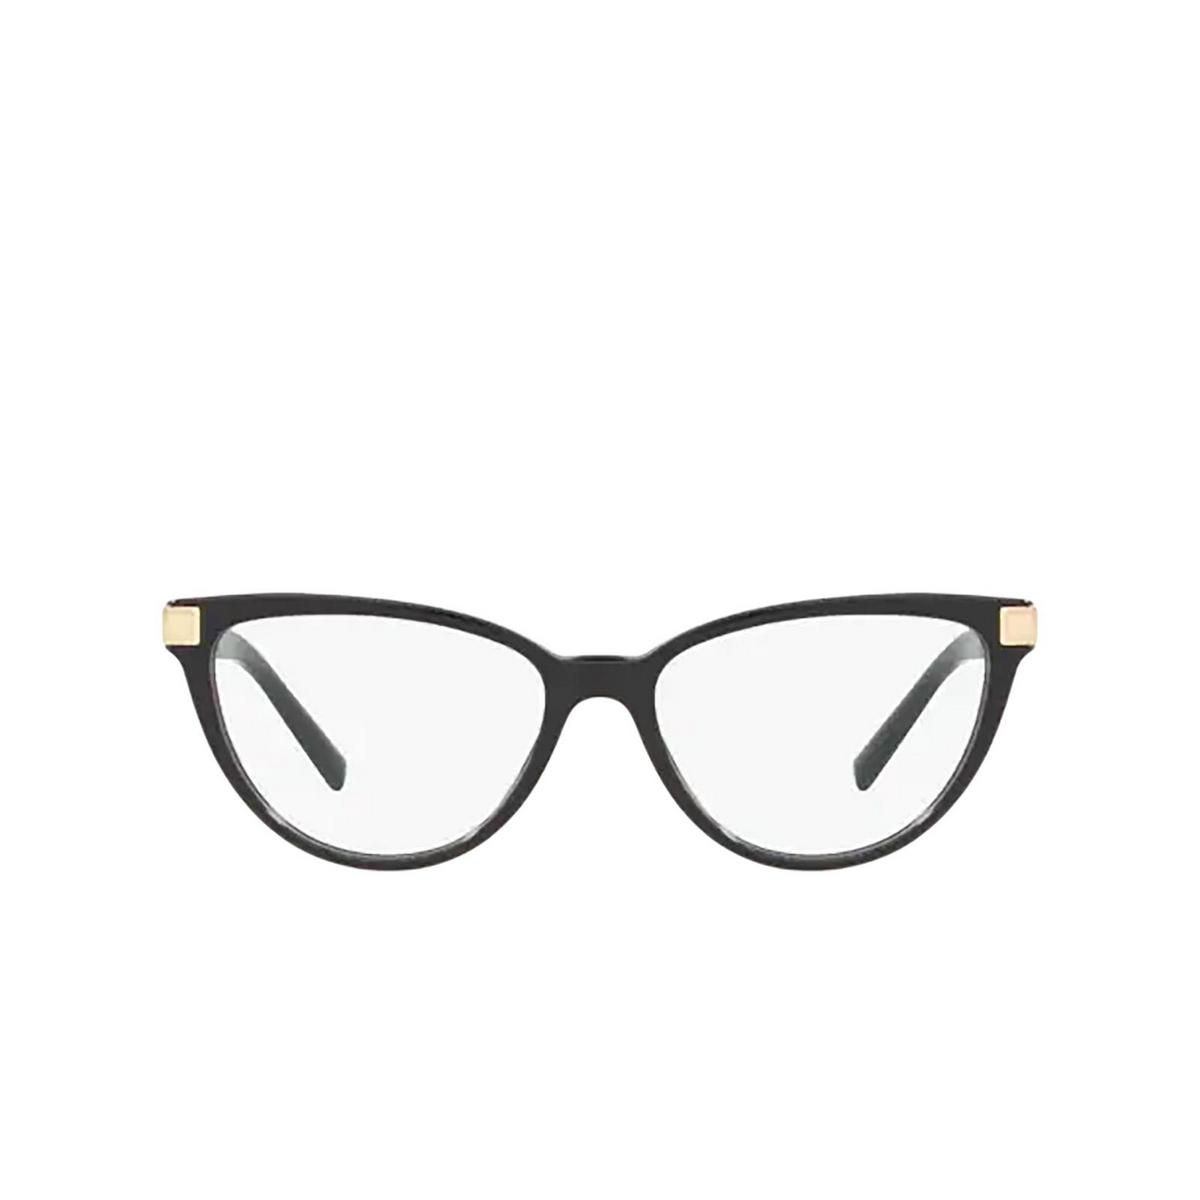 Versace® Cat-eye Eyeglasses: VE3271 color Black GB1 - front view.